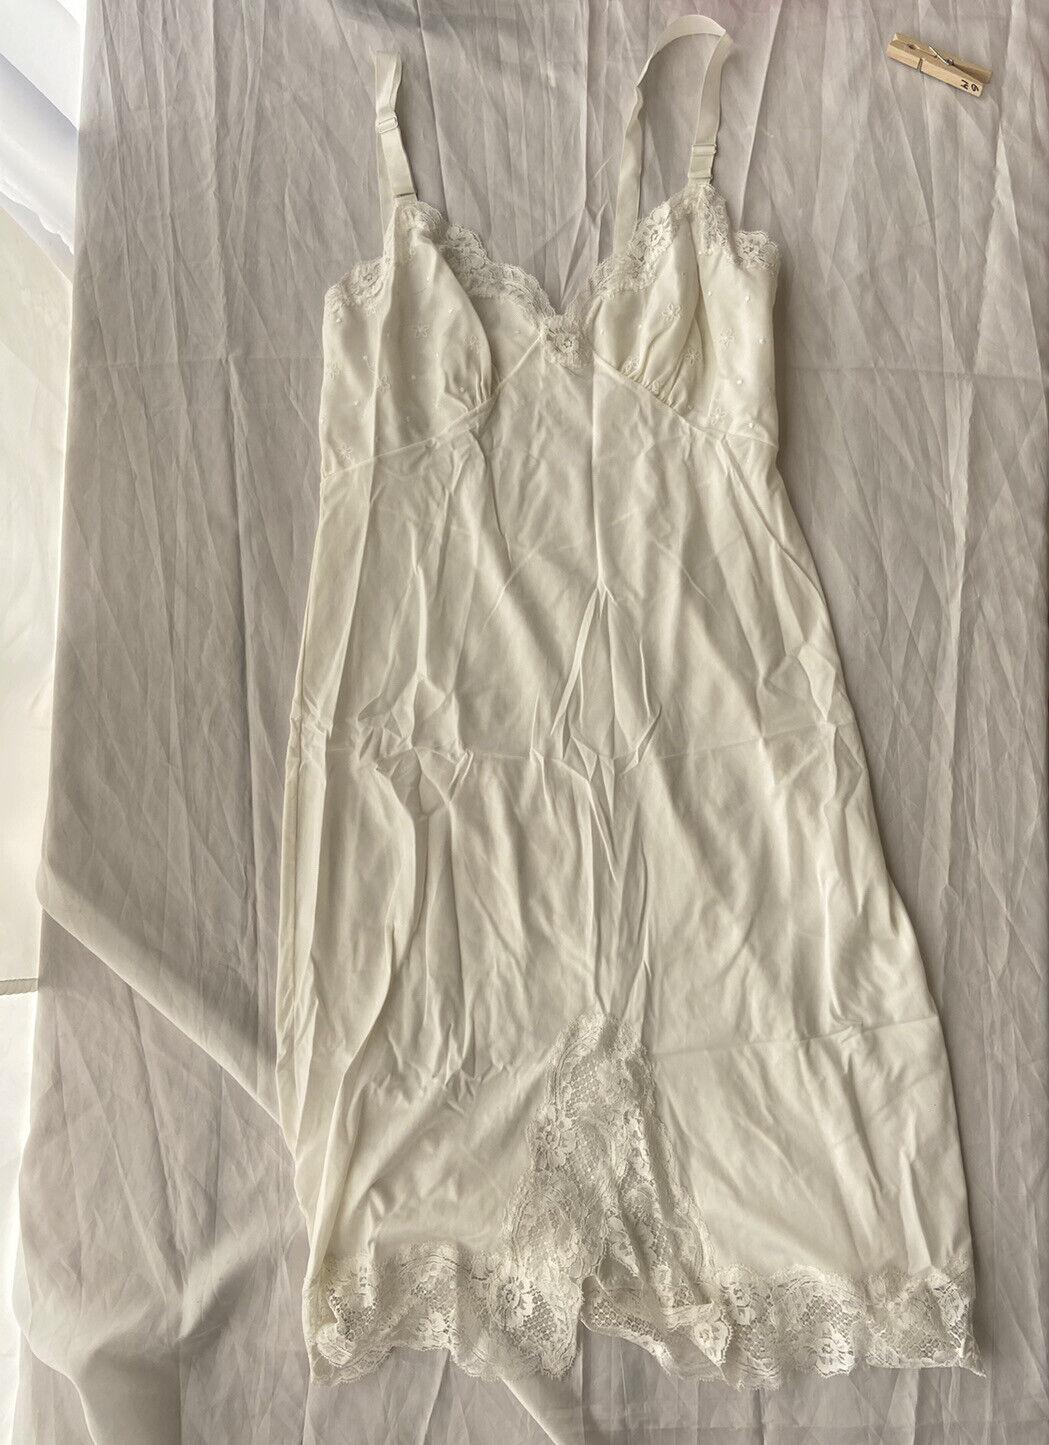 Vintage Kickernick Crystal Pleat Nylon Full Slip 36 White Accordian Accordion